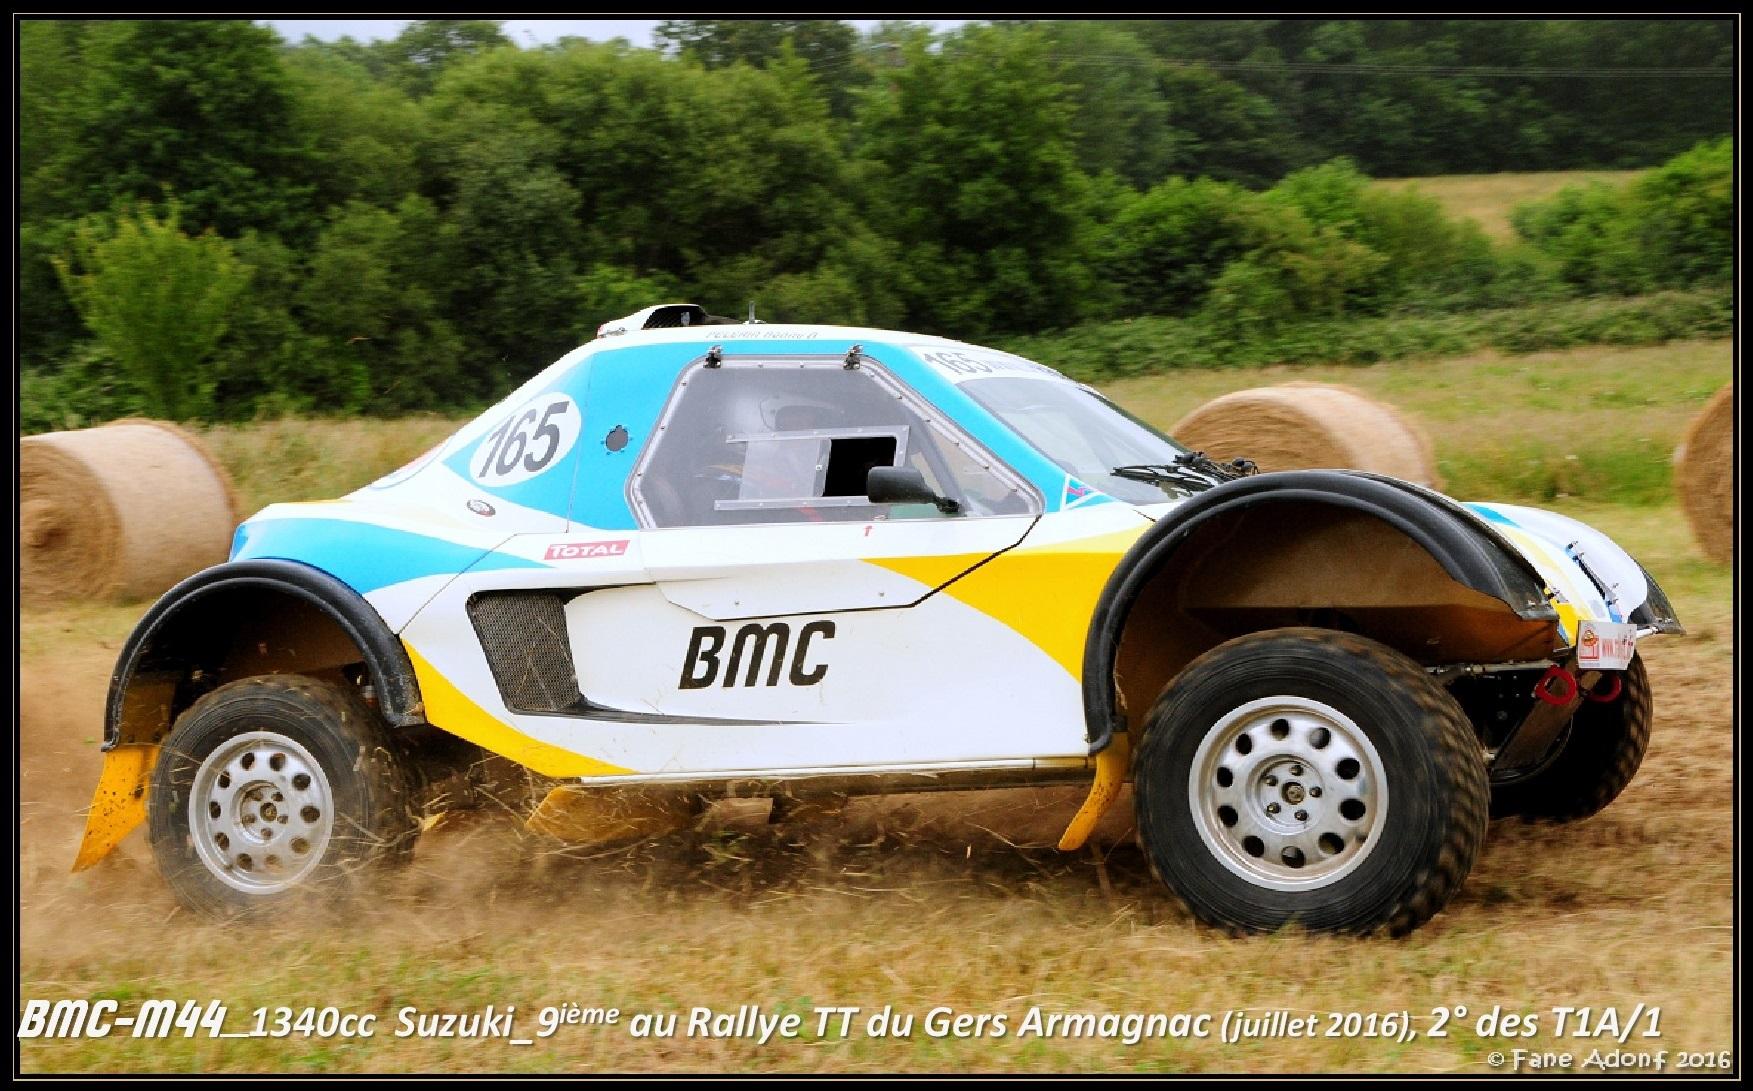 BMC-M44_Saison 2016_11